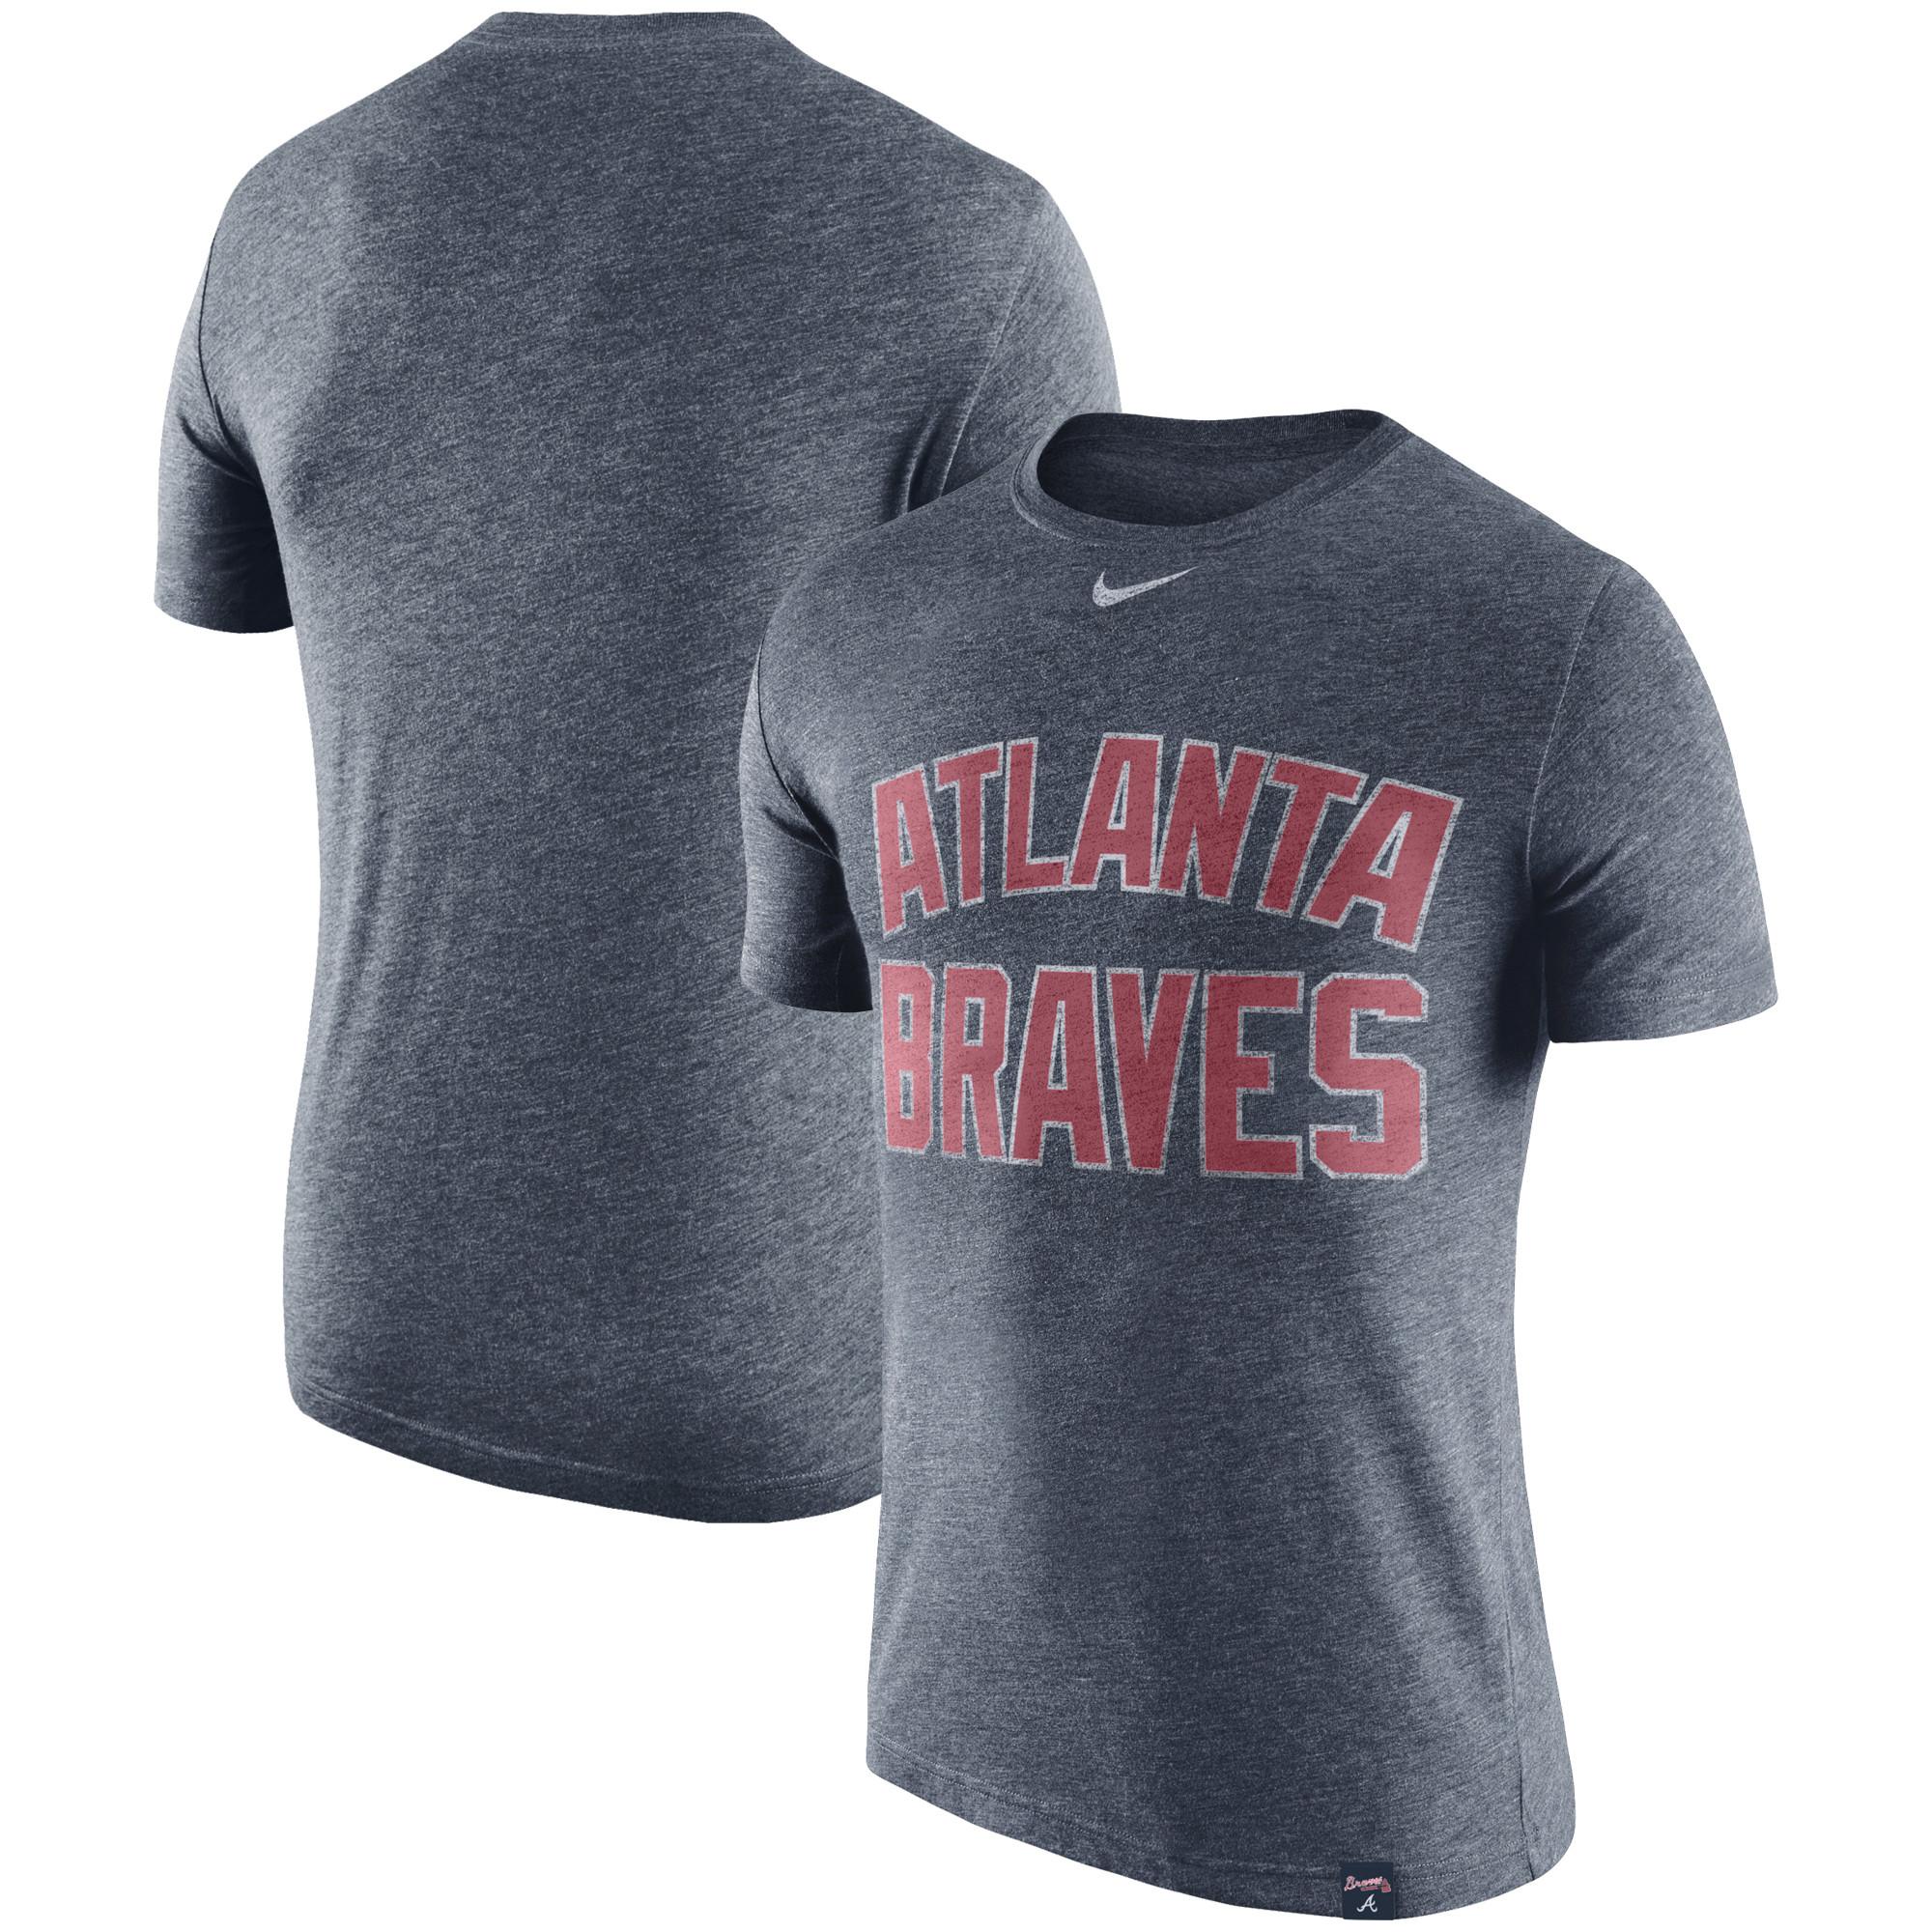 Atlanta Braves Nike Tri-Blend DNA Performance T-Shirt - Heathered Navy